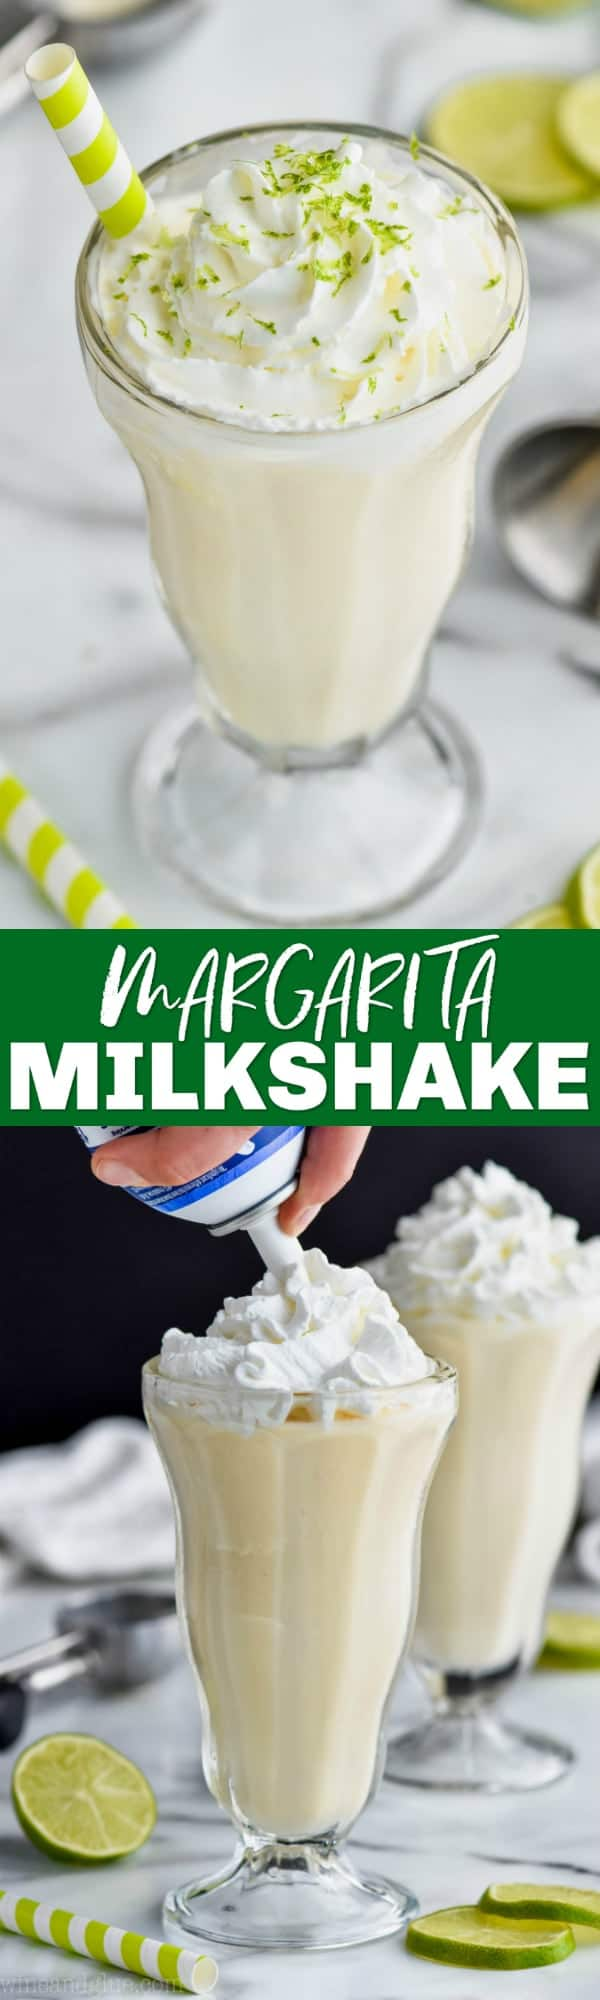 collage of margarita milkshake